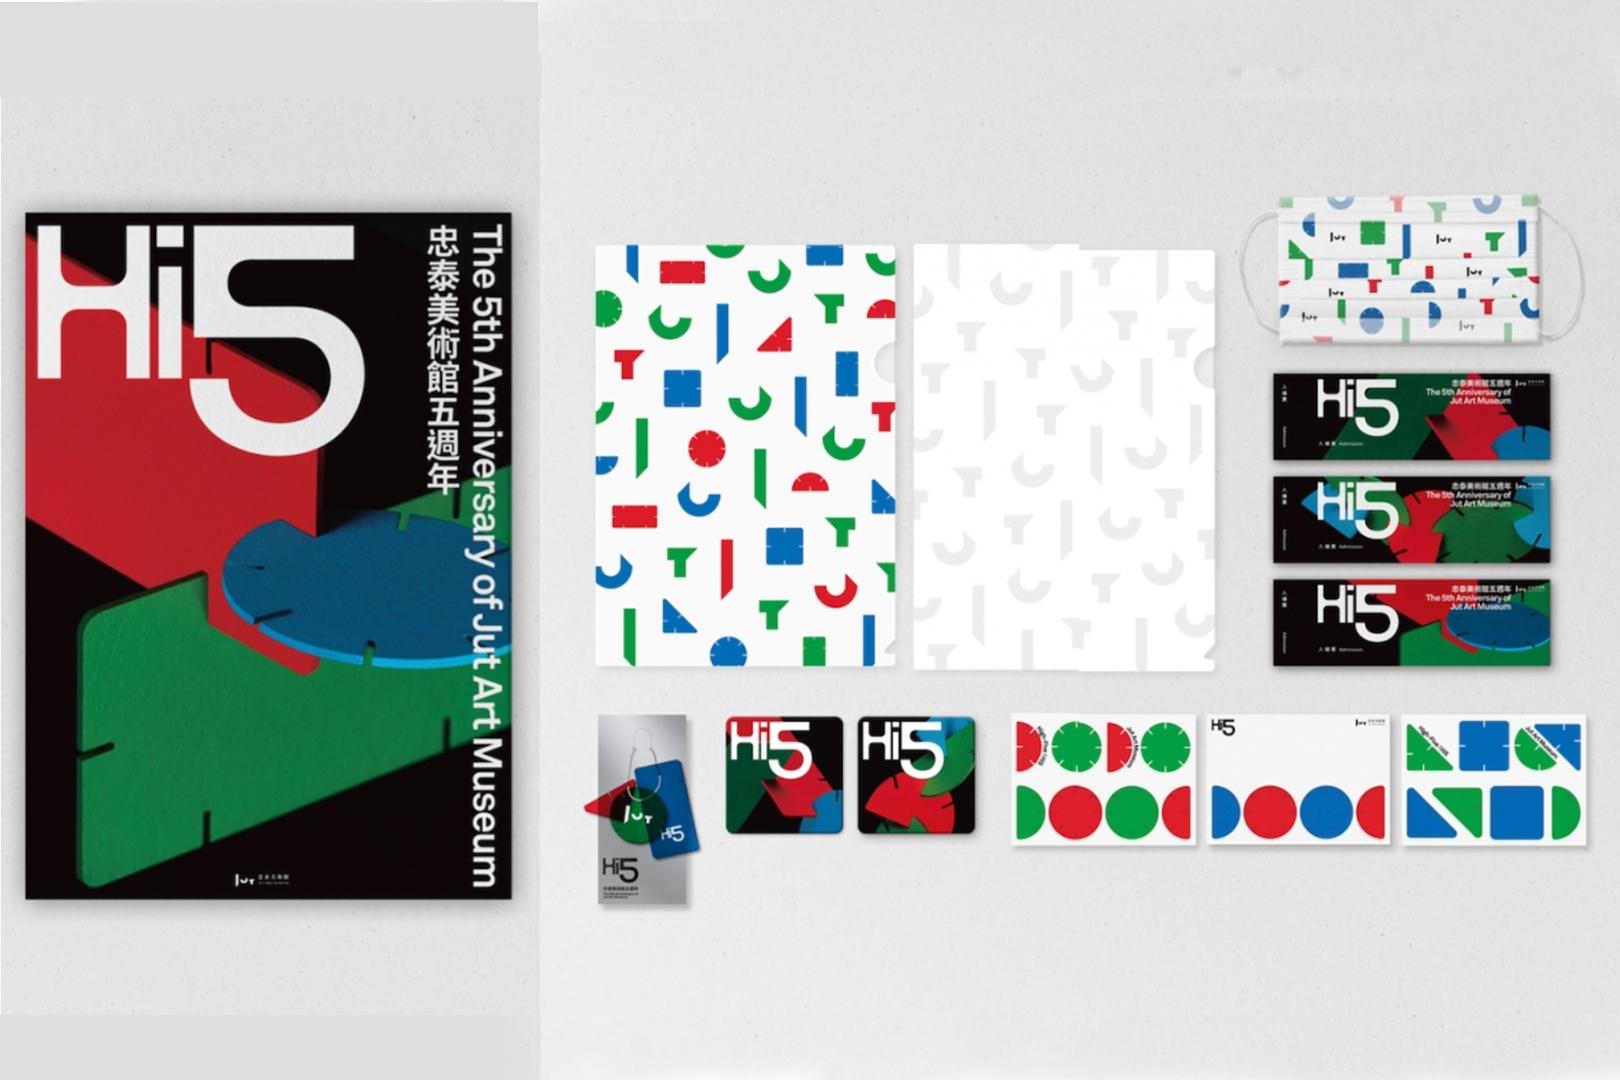 O.OO 操刀忠泰美術館 5 週年主視覺!以三原色、幾何圖形演繹「建築為城市雕塑」,周邊商品陸續釋出